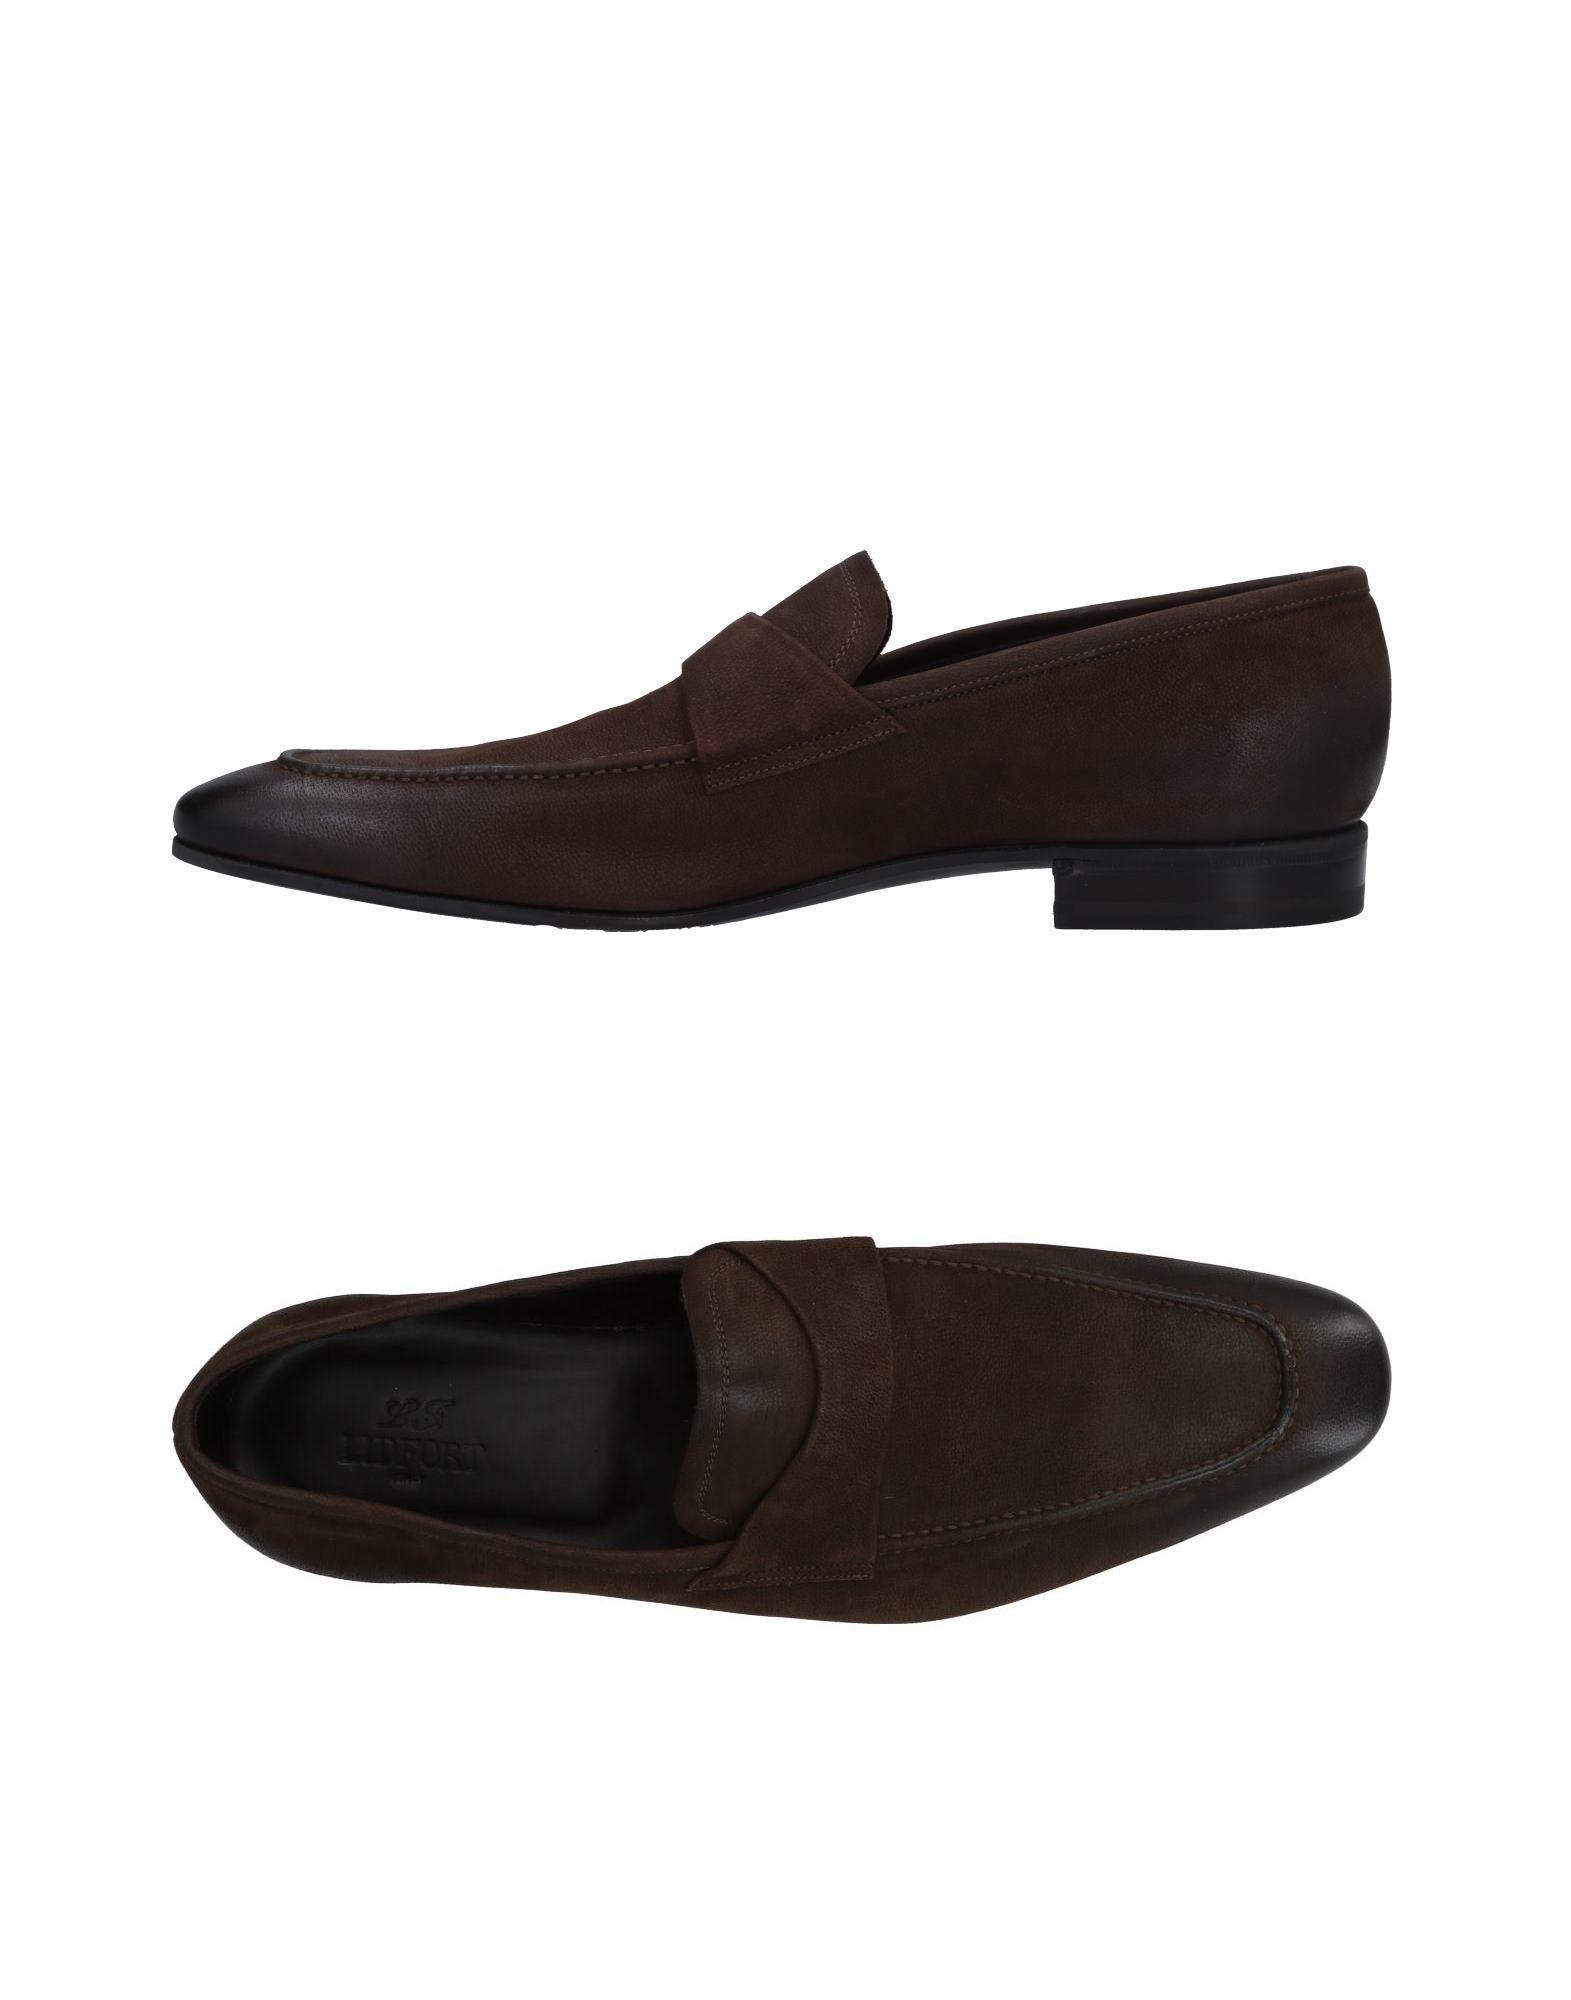 Lidfort Mokassins Herren  11497194OL Gute Qualität beliebte Schuhe